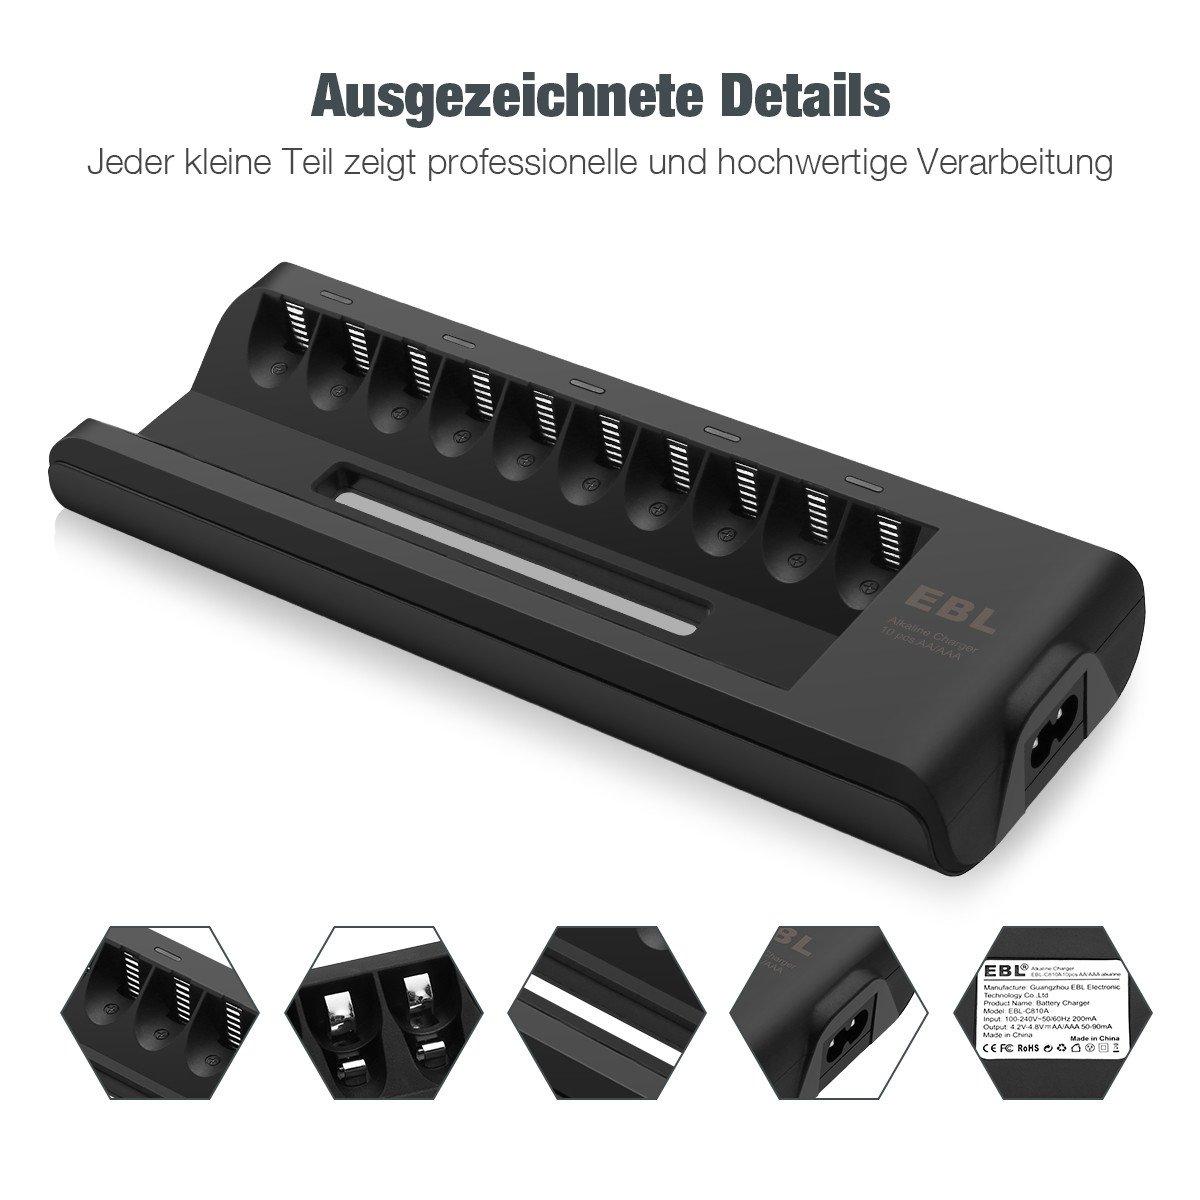 EBL Batterie Ladegerät für 10 Stücke AA AAA Alkaline Batterien(Akkus nicht inkl.)